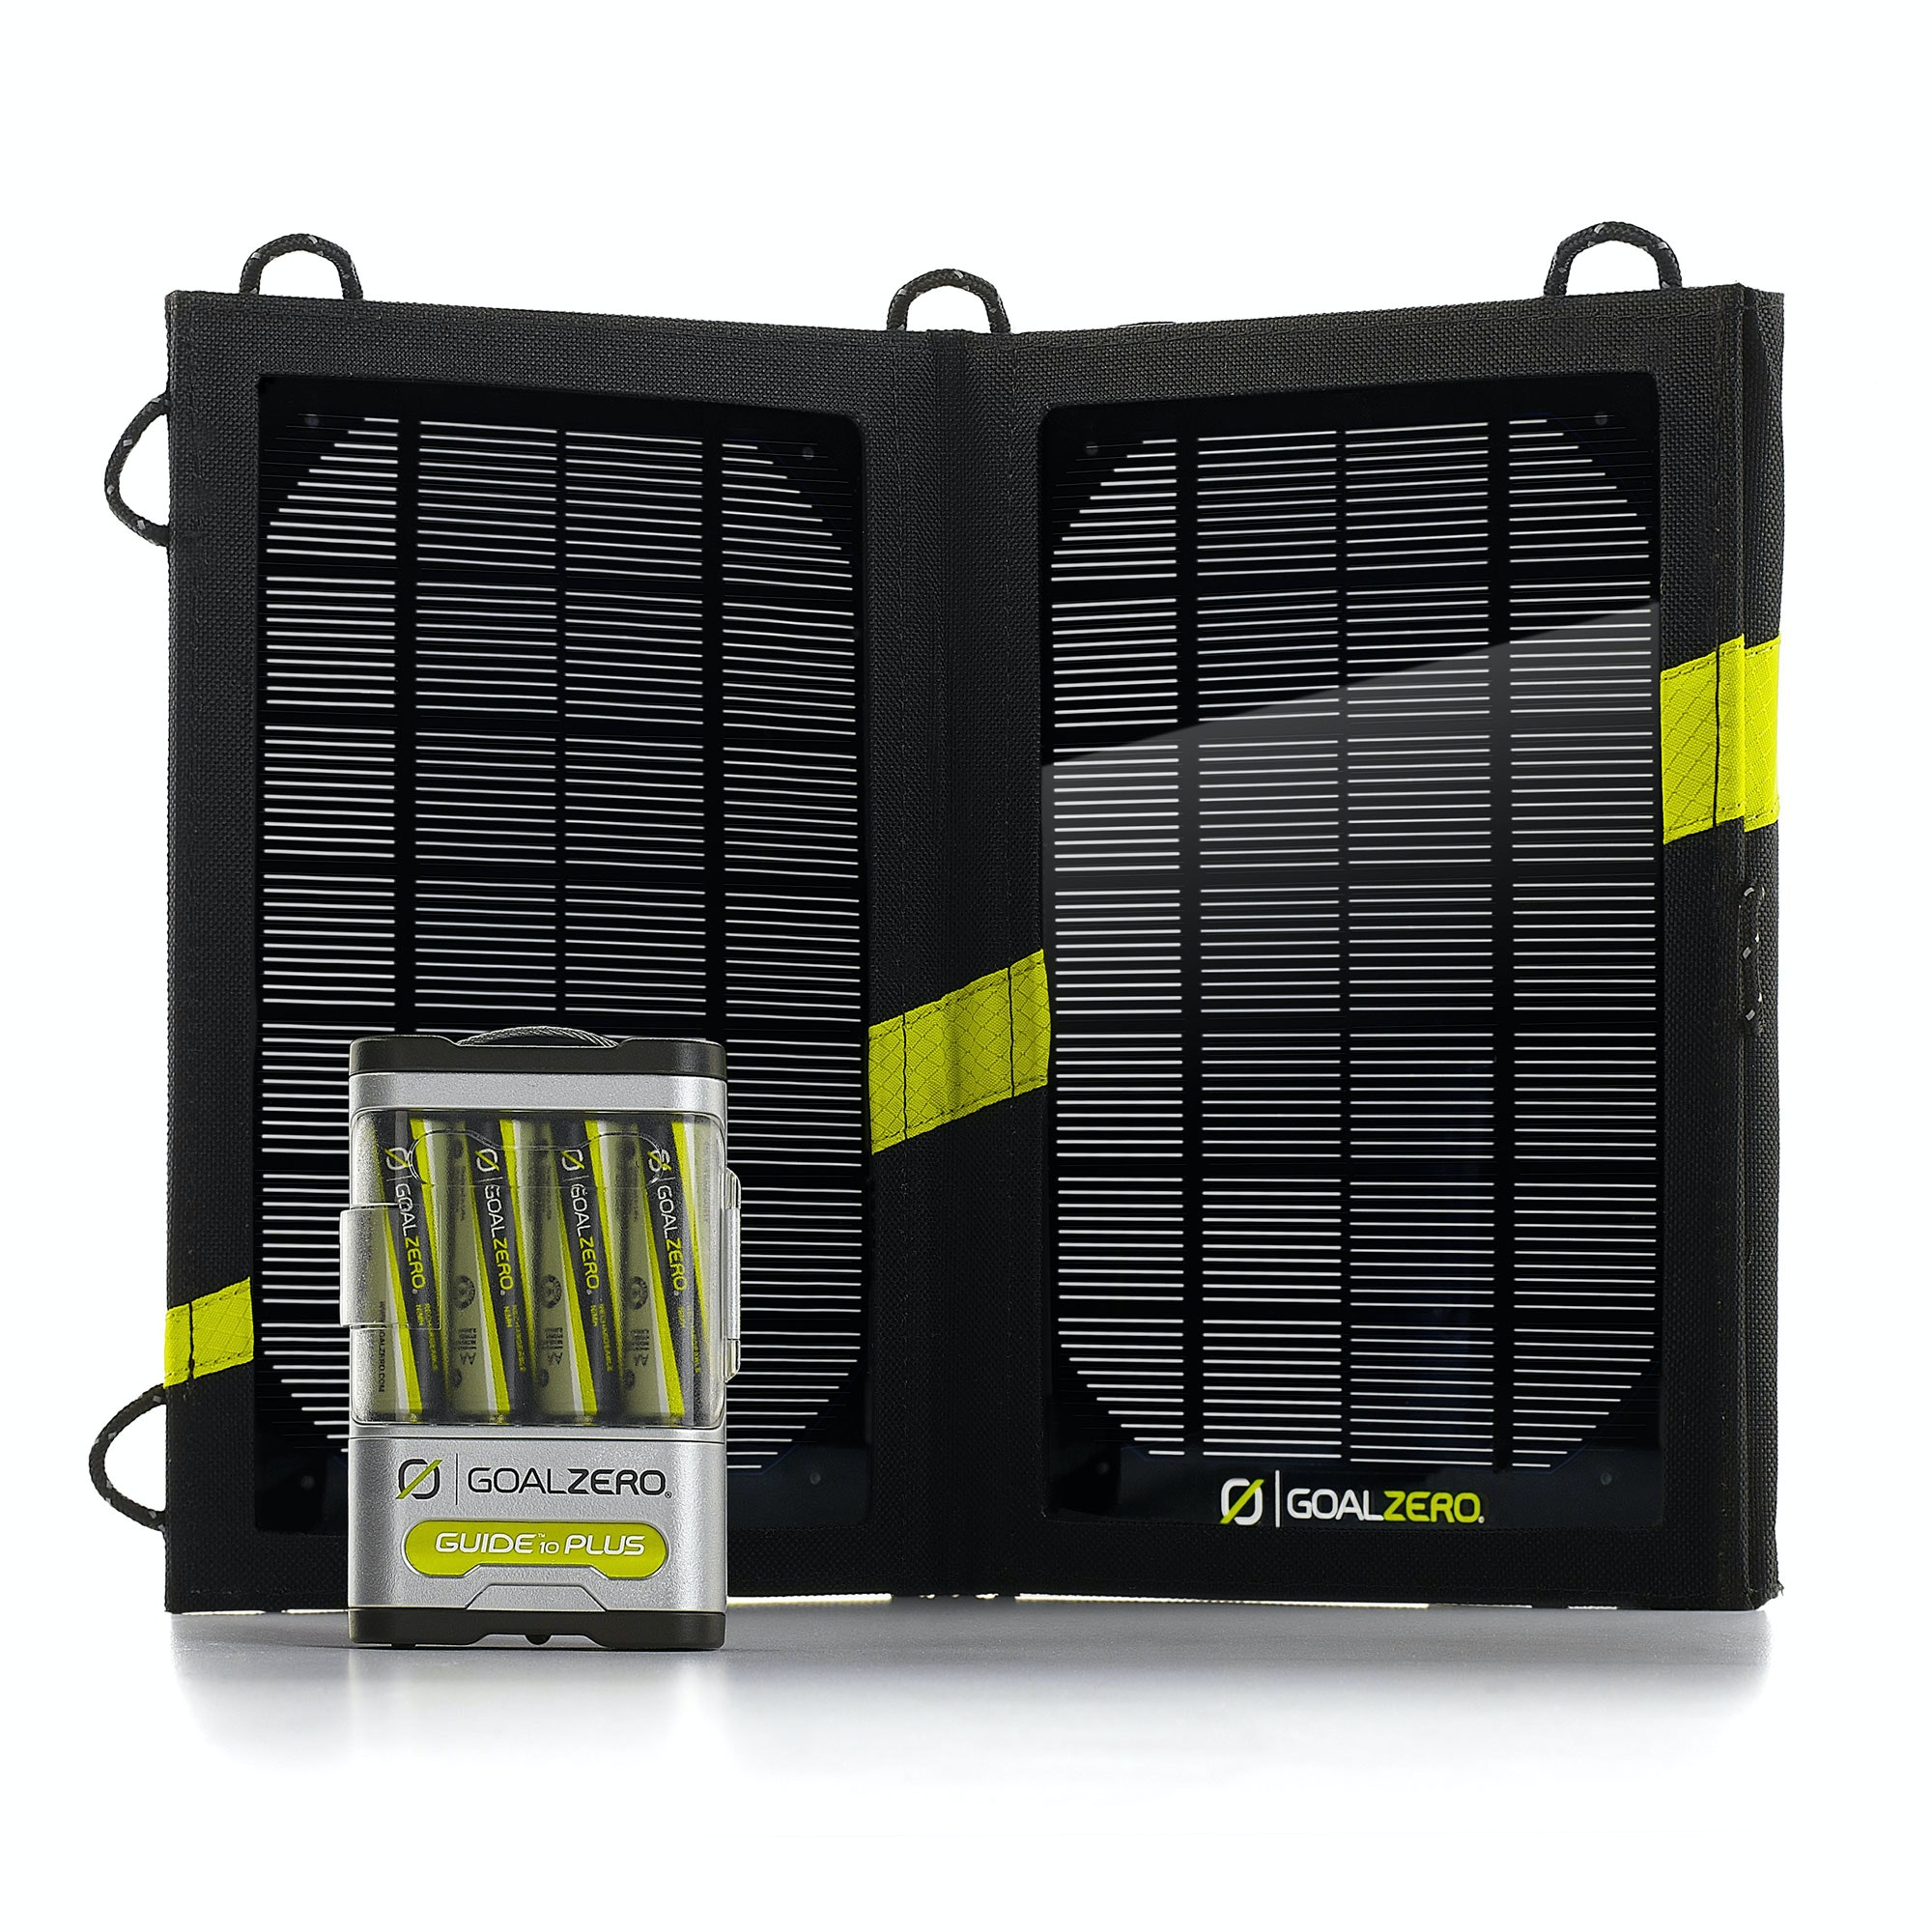 goal zero guide 10 plus solar power battery travel phone recharger kit ebay. Black Bedroom Furniture Sets. Home Design Ideas